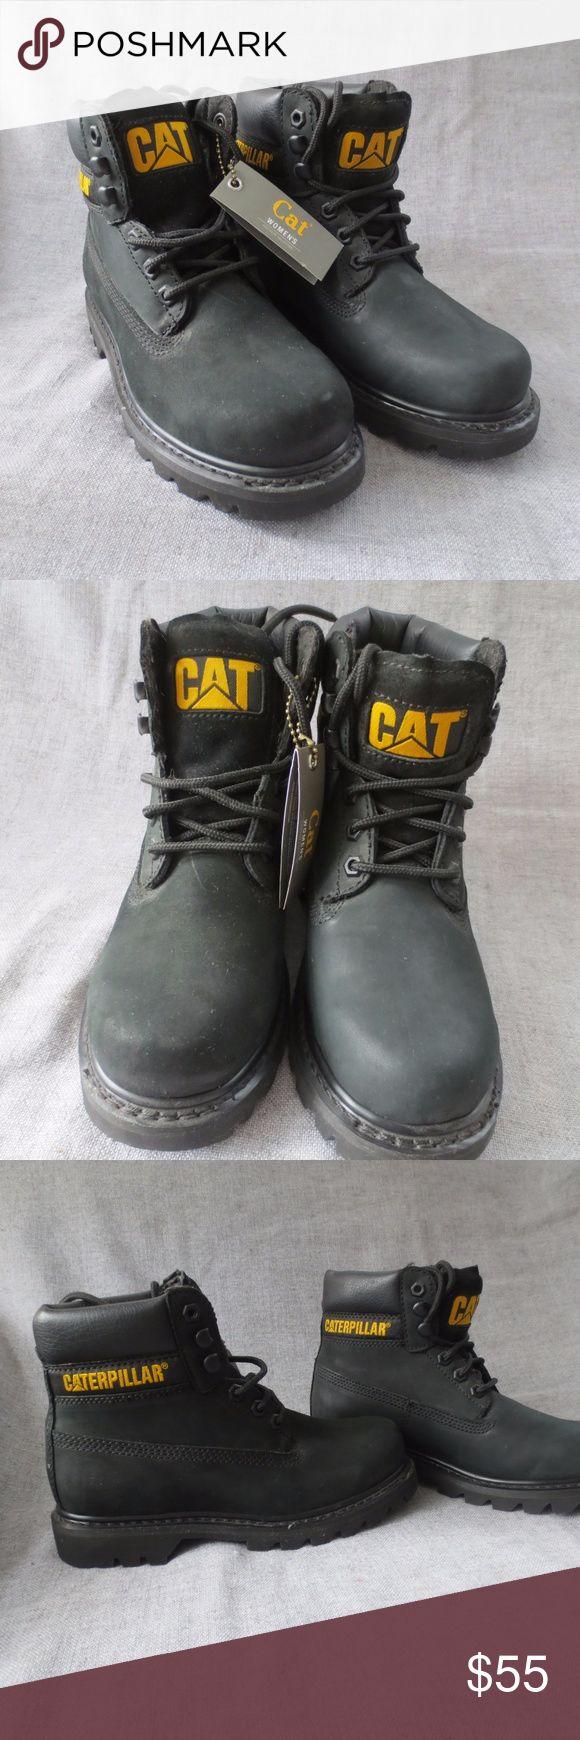 CATERPILLAR CAT Women's Colorado Boot - Size 6 CATERPILLAR brand women's Colorado Boot - all black with yellow CAT logo. Size 6 Never Worn Caterpillar Shoes Combat & Moto Boots